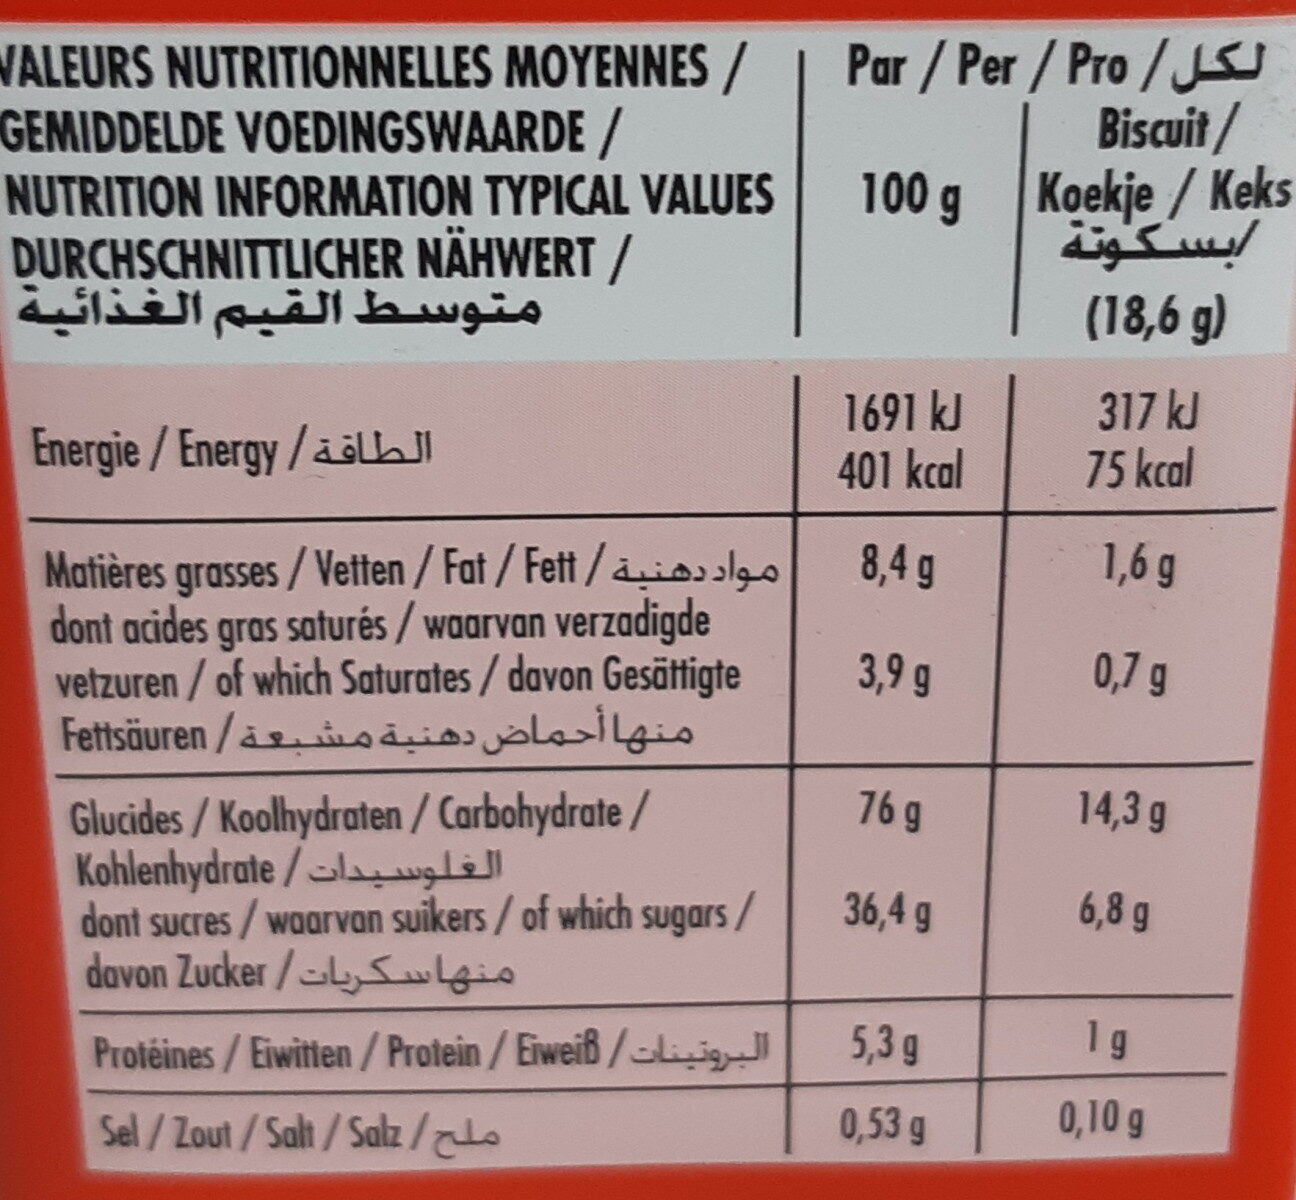 BN FRAISE 295 G - Valori nutrizionali - fr